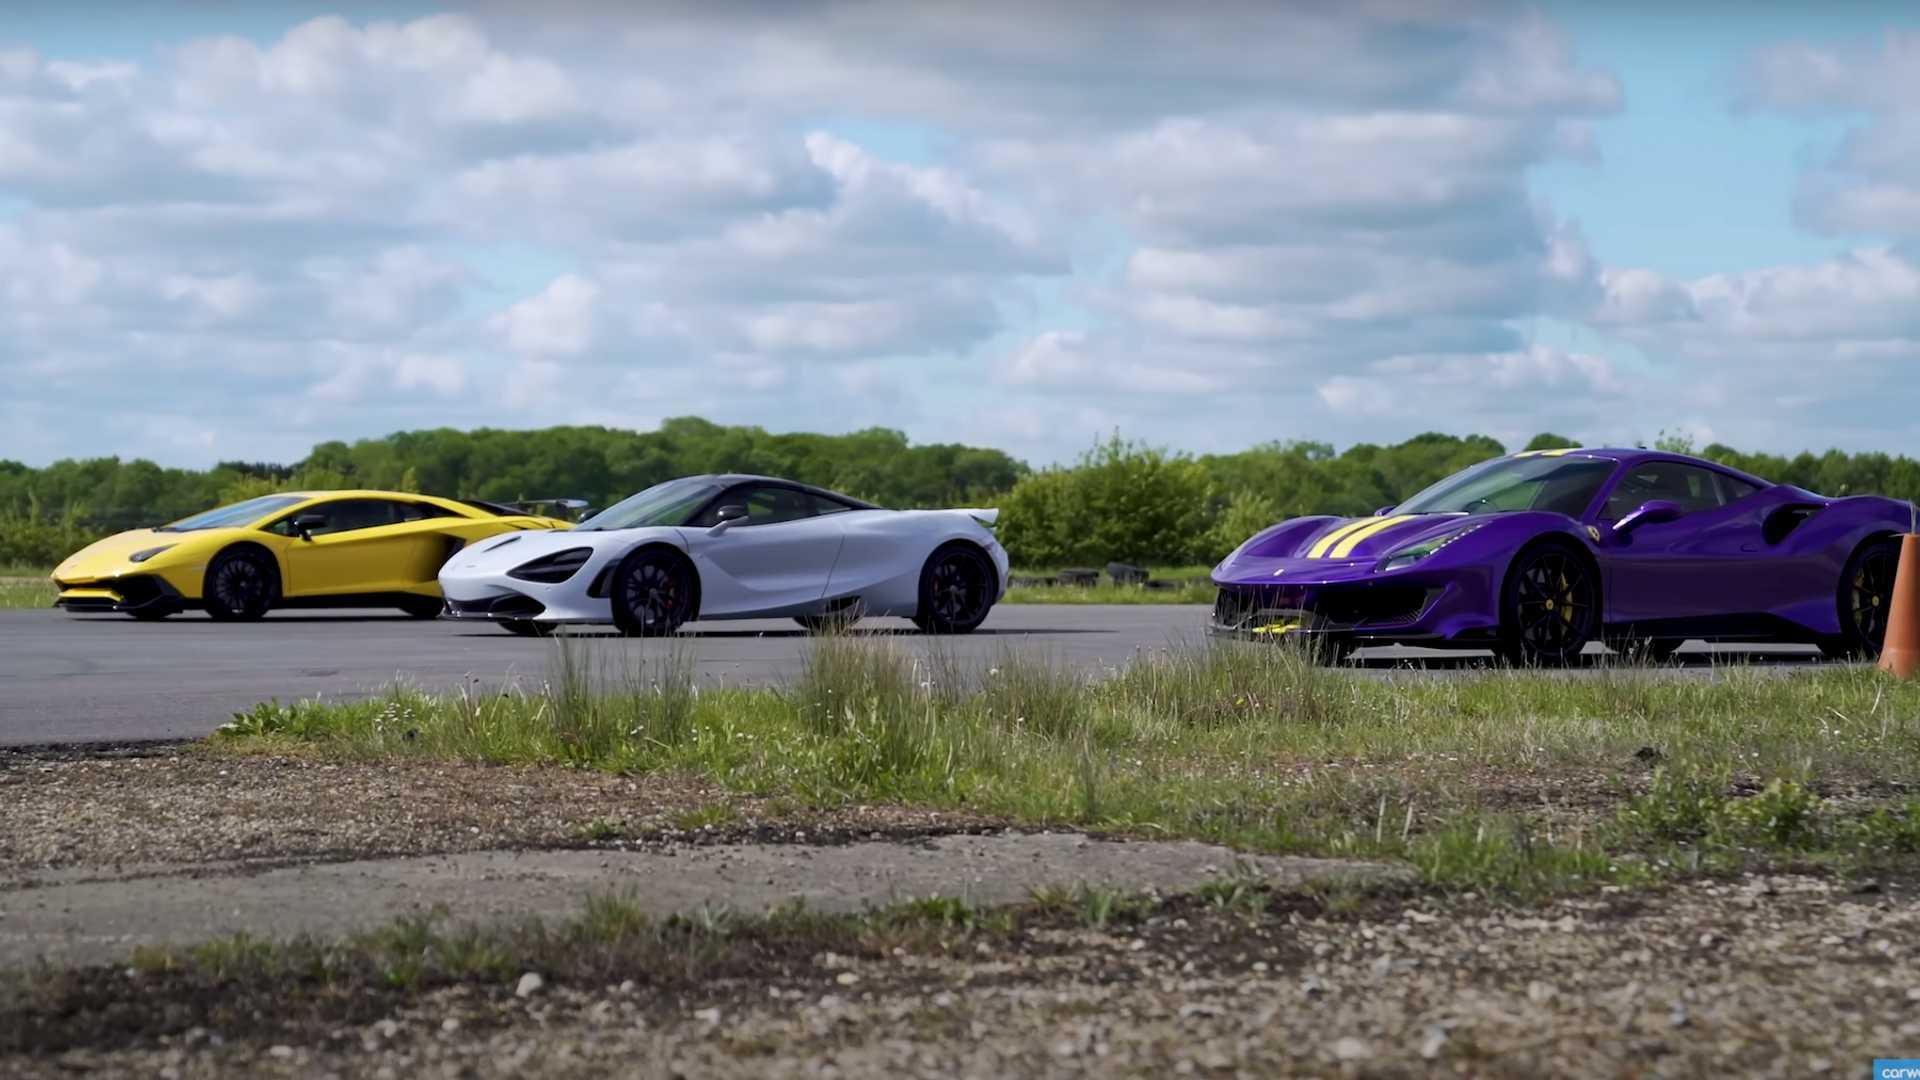 McLaren 720S, Ferrari 488 Pista, Lamborghini Aventador SV Drag Race